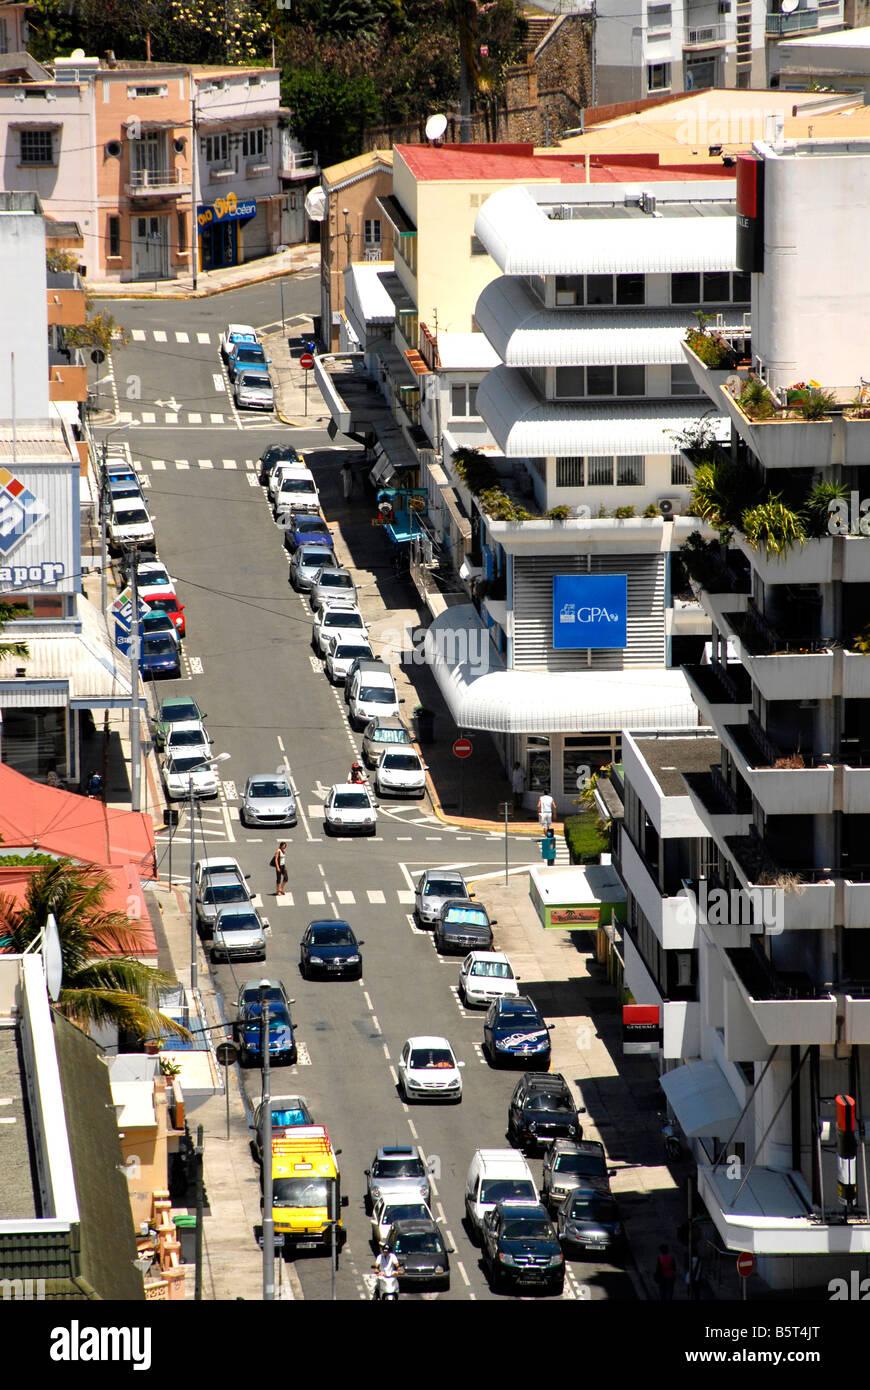 Sreet scene Noumea New Caledonia - Stock Image